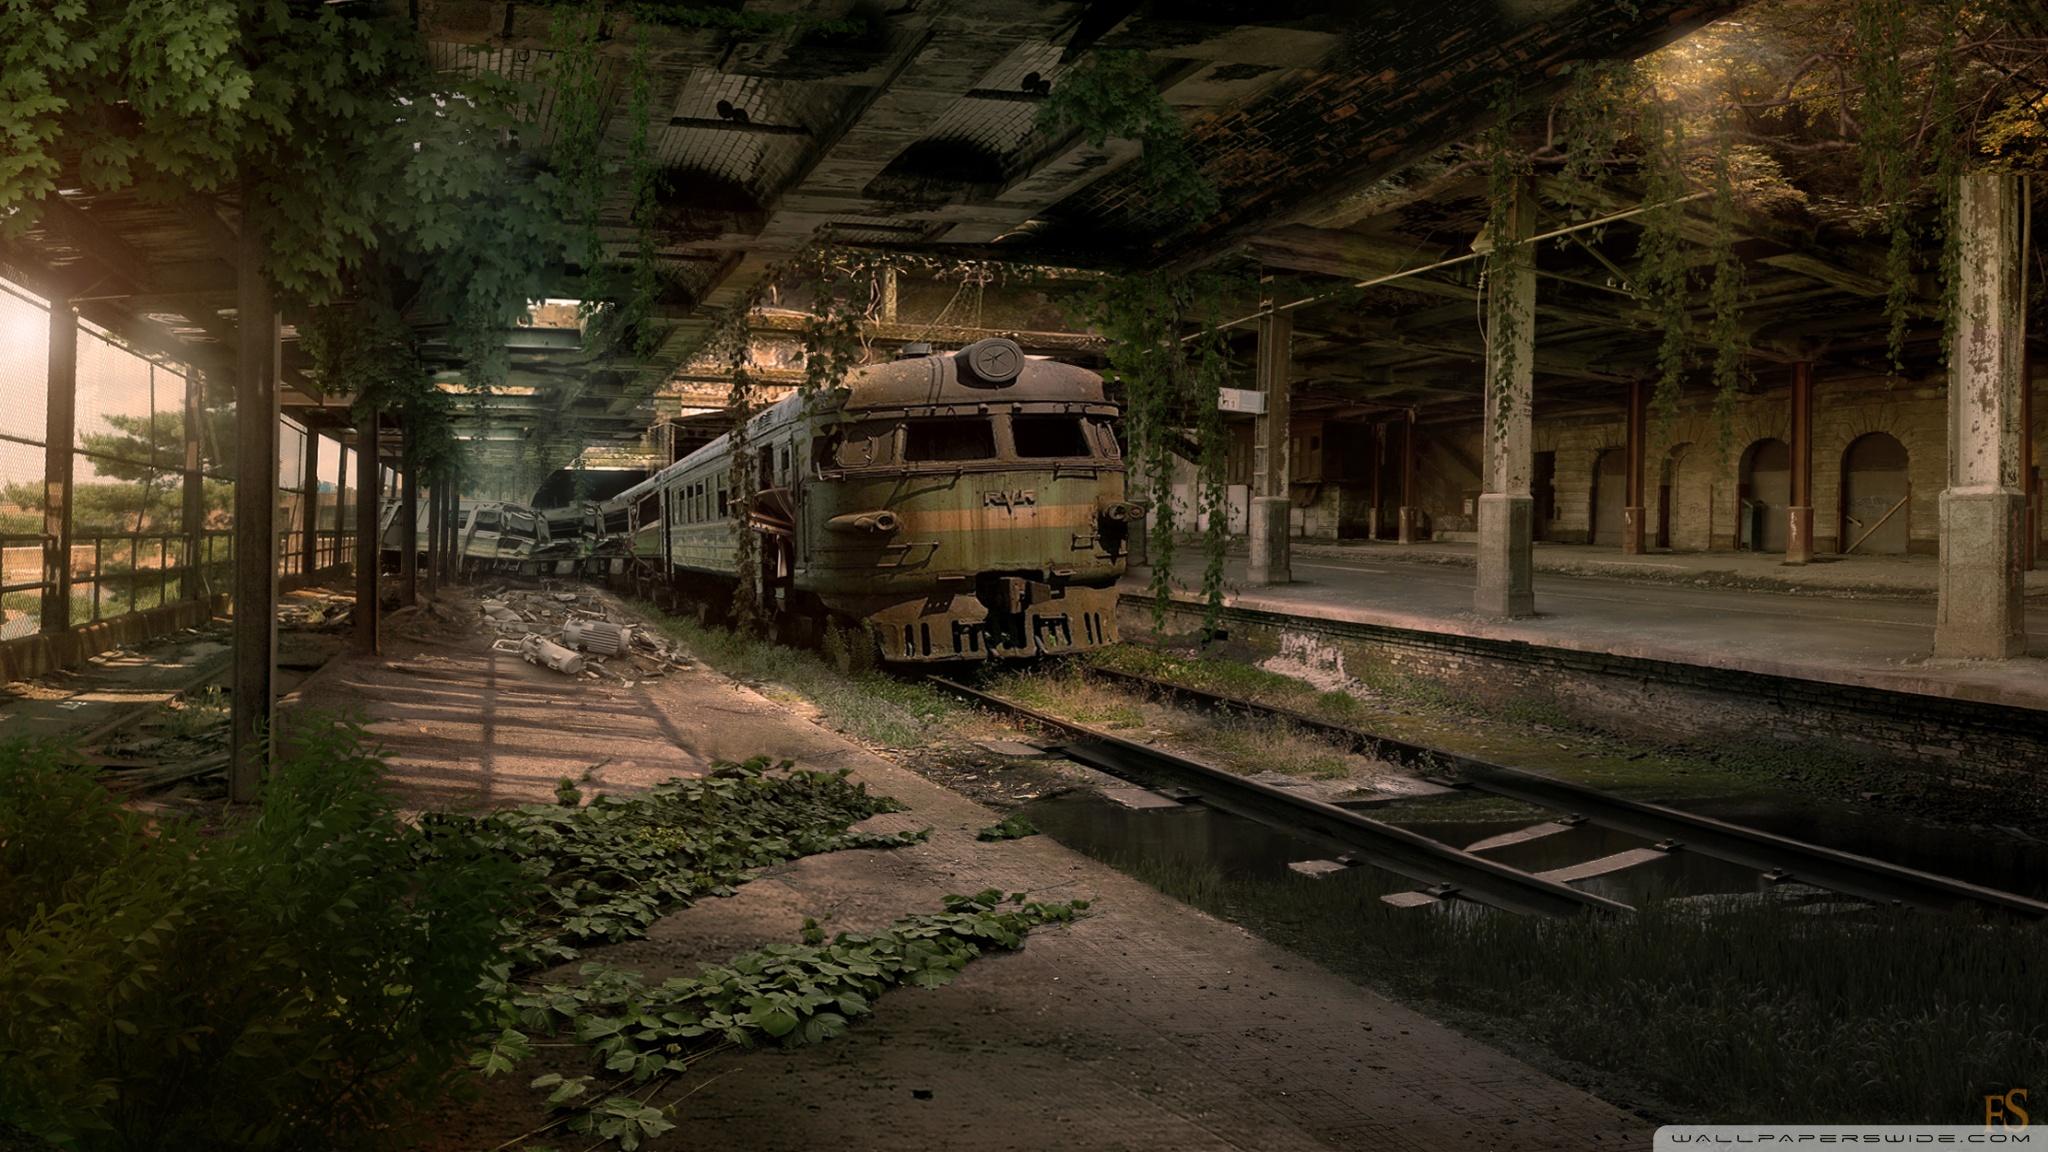 Abandoned Train Station Wallpaper